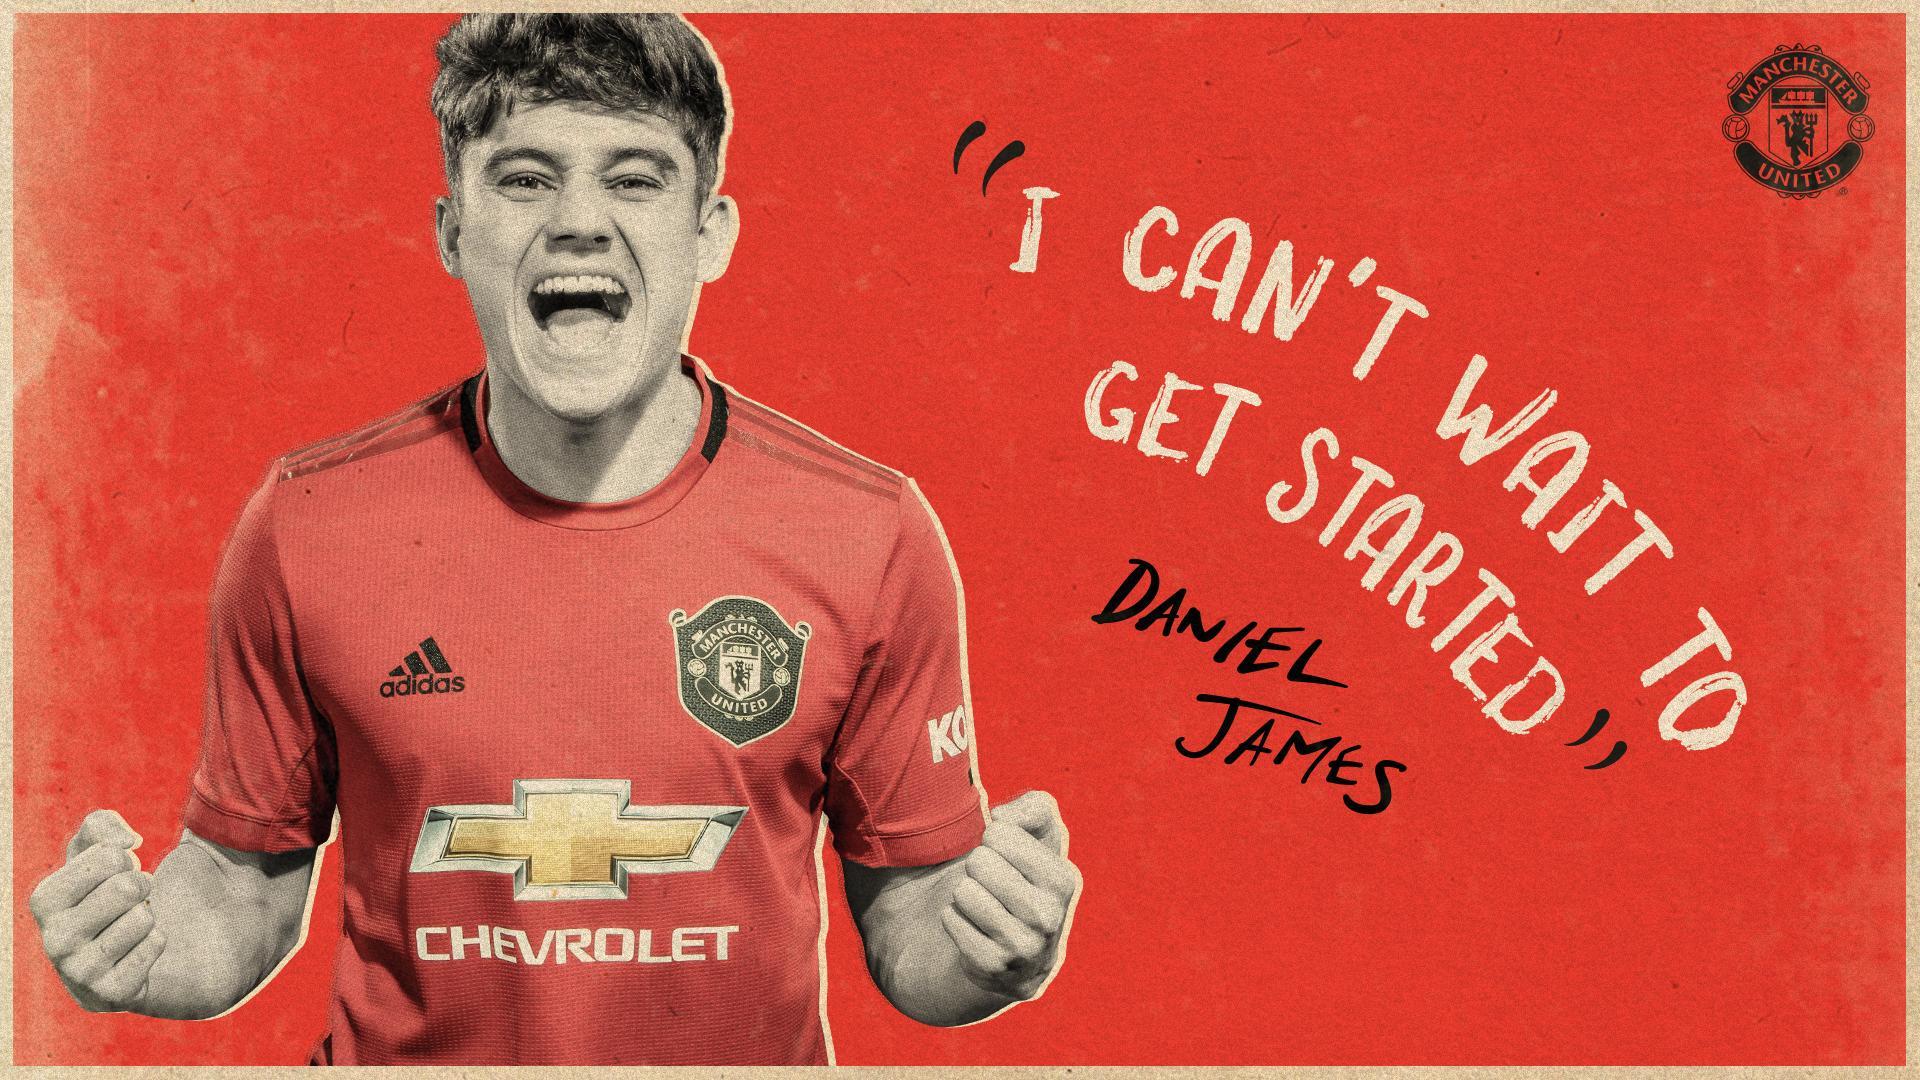 Daniel James Manchester United Wallpaper Dswijaya